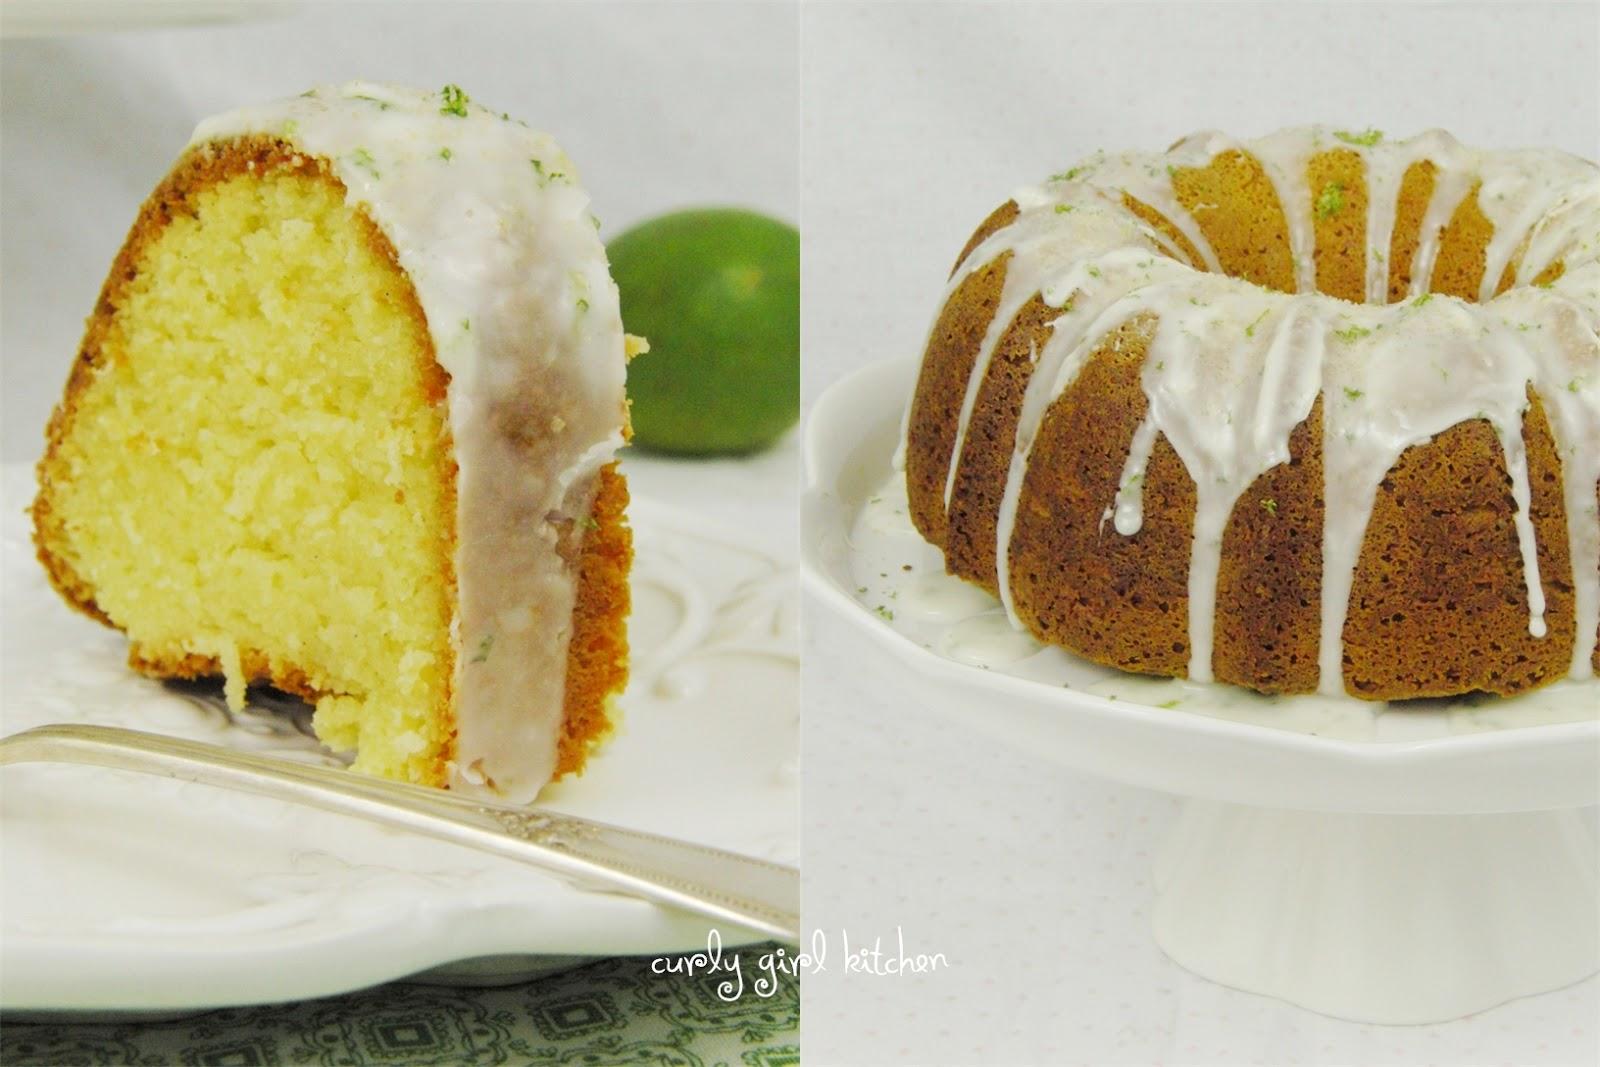 ... .curlygirlkitchen.com/2013/02/vanilla-bean-pound-cake-with-lime.html